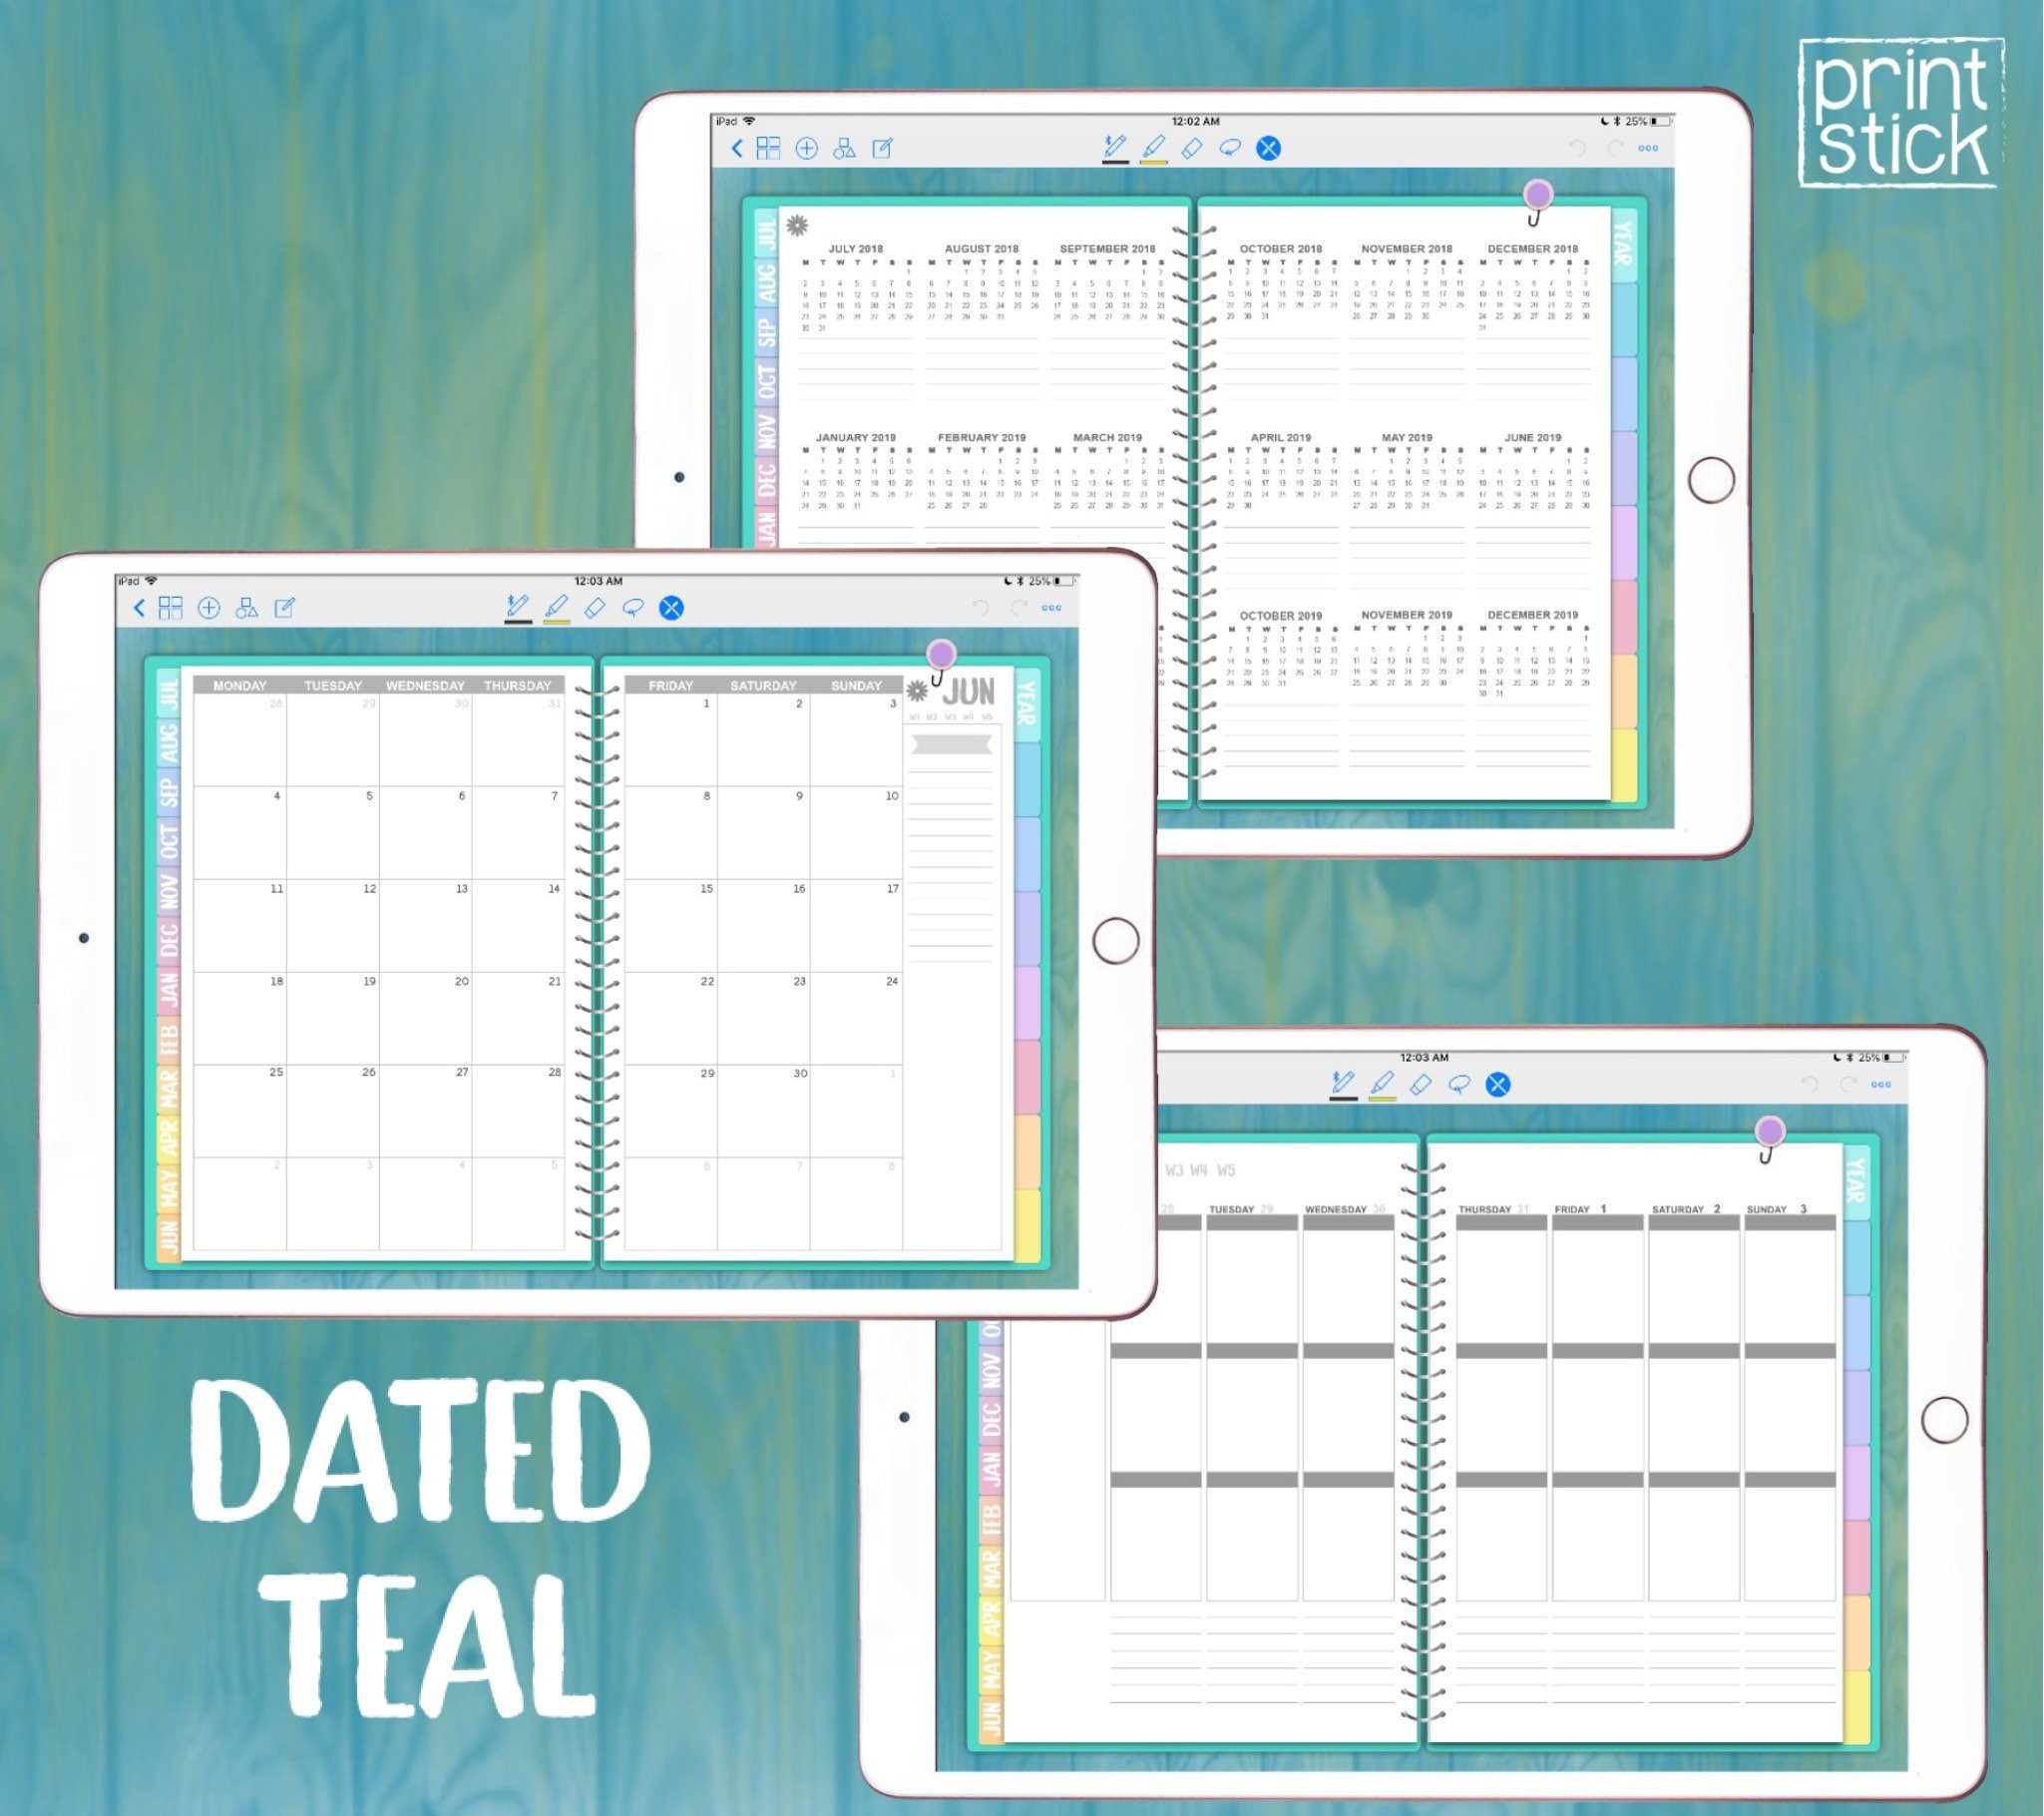 Calendario Semanal 2019 Para Imprimir Gratis Actual Planificador Digital Ipad Con Fechas Goodnotes Notability Of Calendario Semanal 2019 Para Imprimir Gratis Recientes Calendário 2019